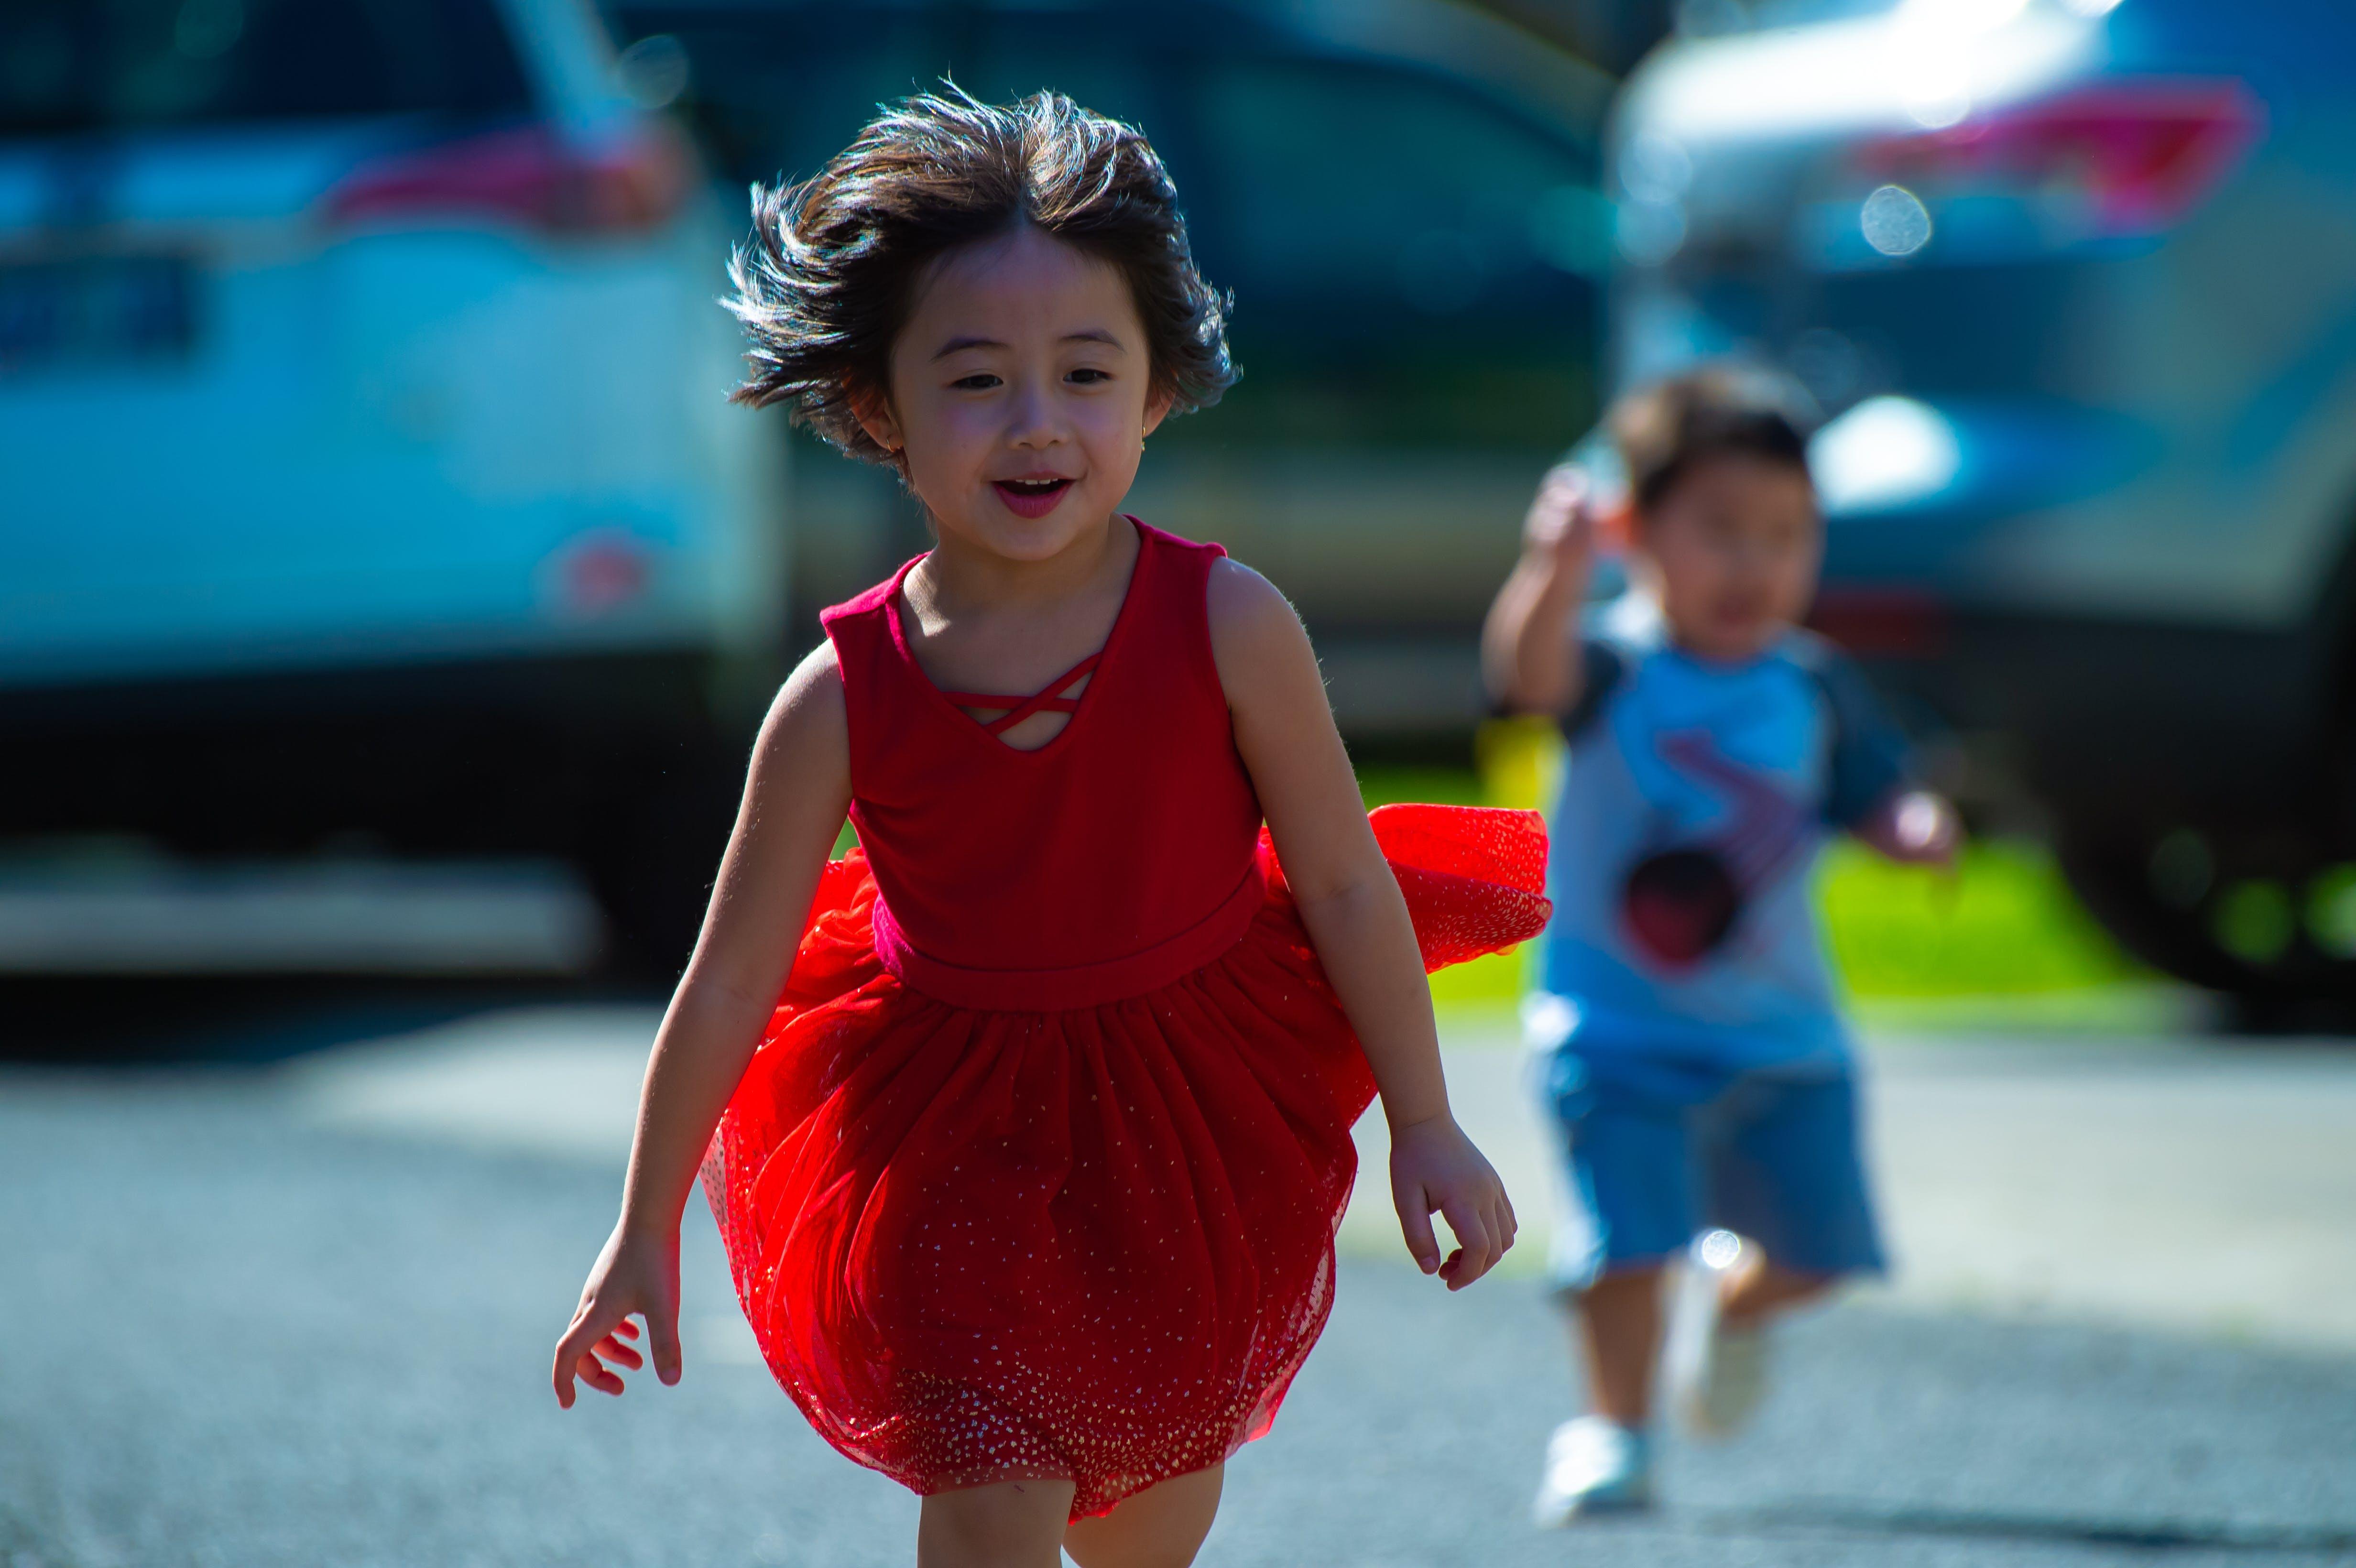 Photo of Girl in Red Dress Running on Street